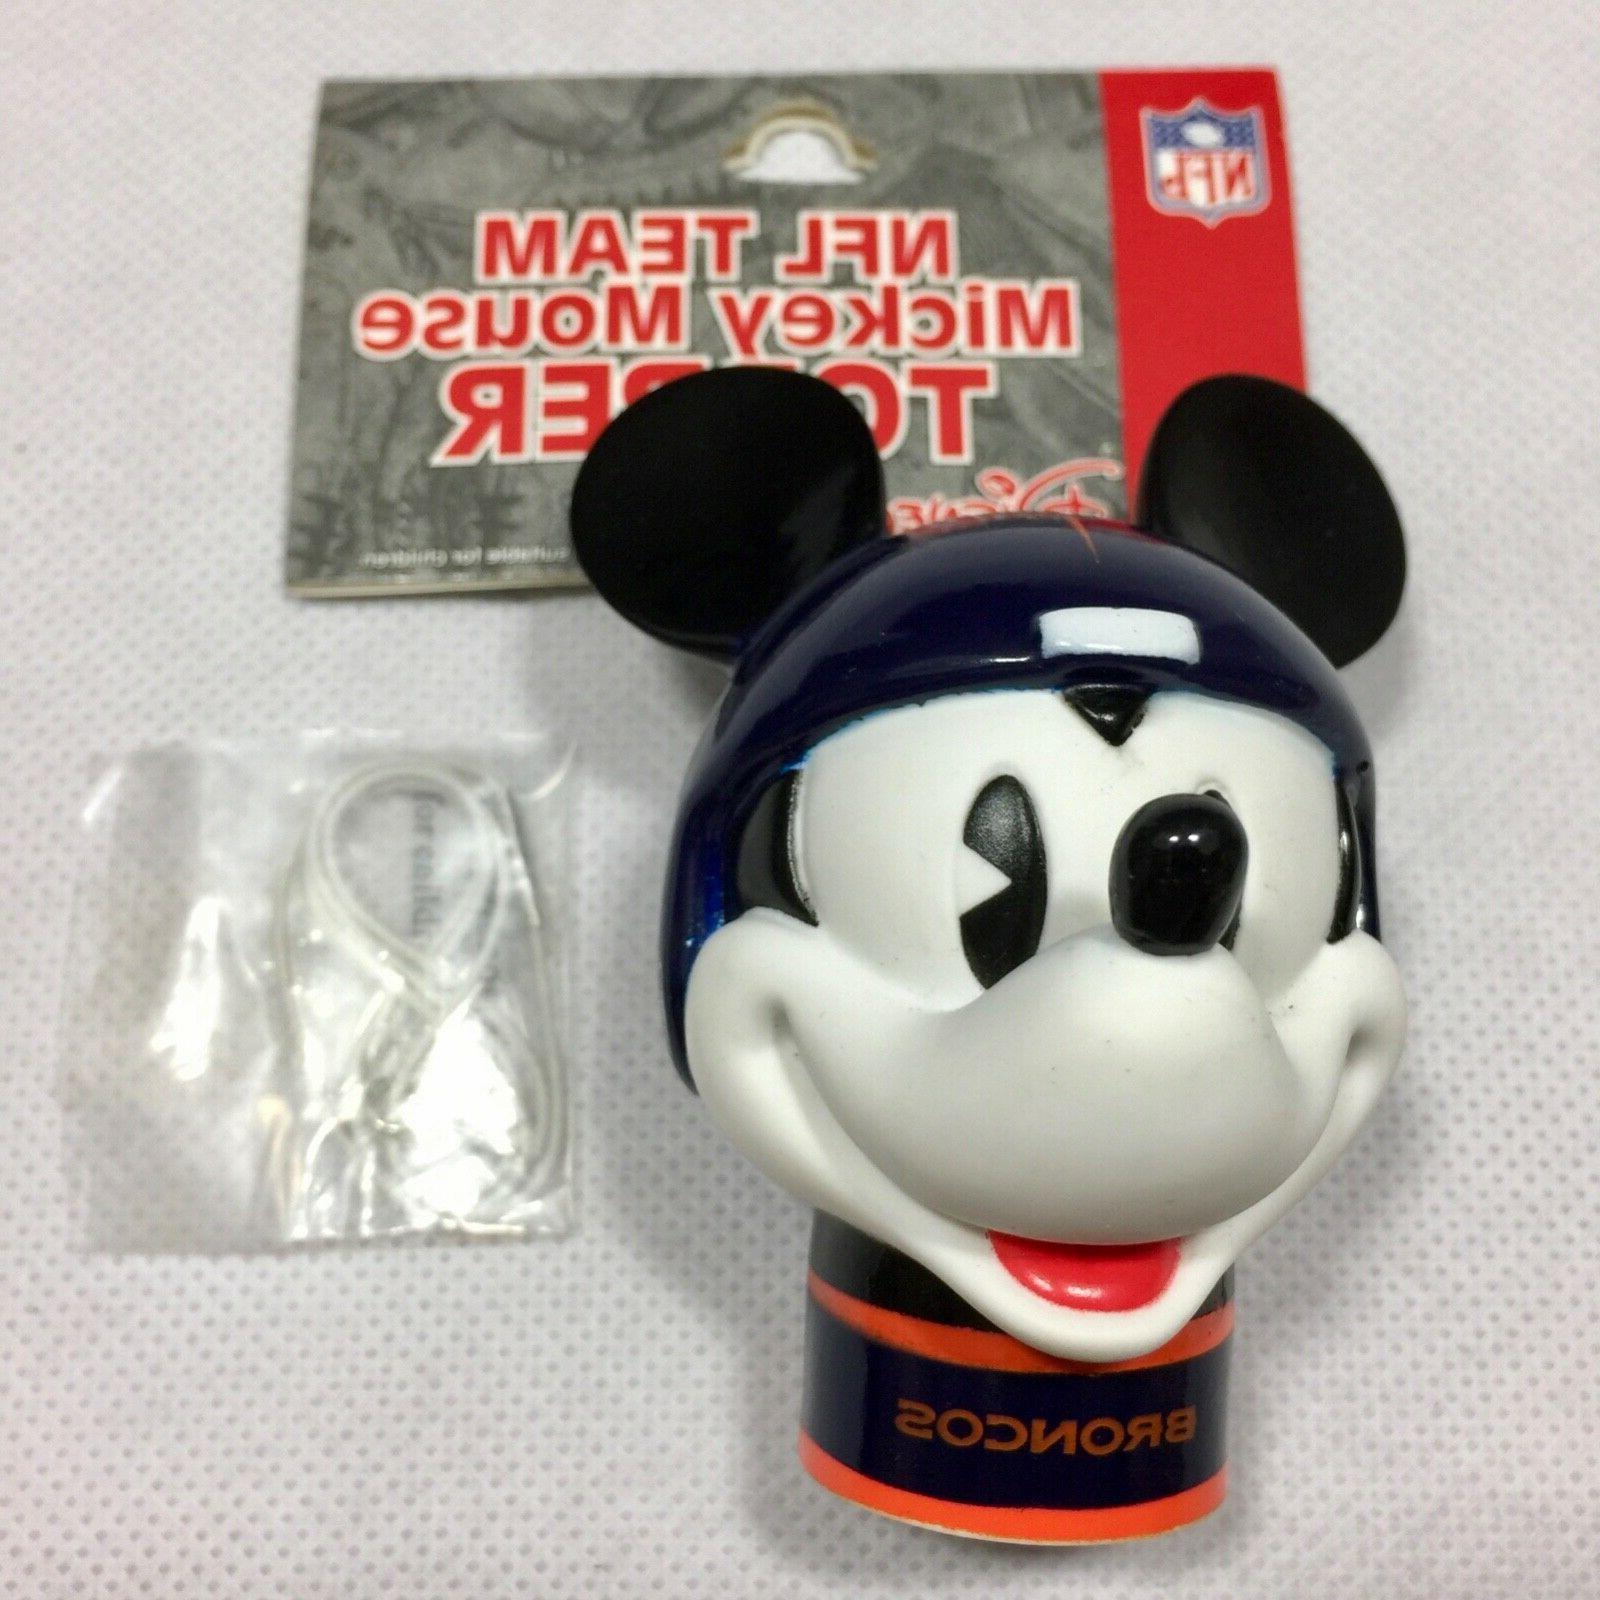 nfl denver broncos mickey mouse antenna topper